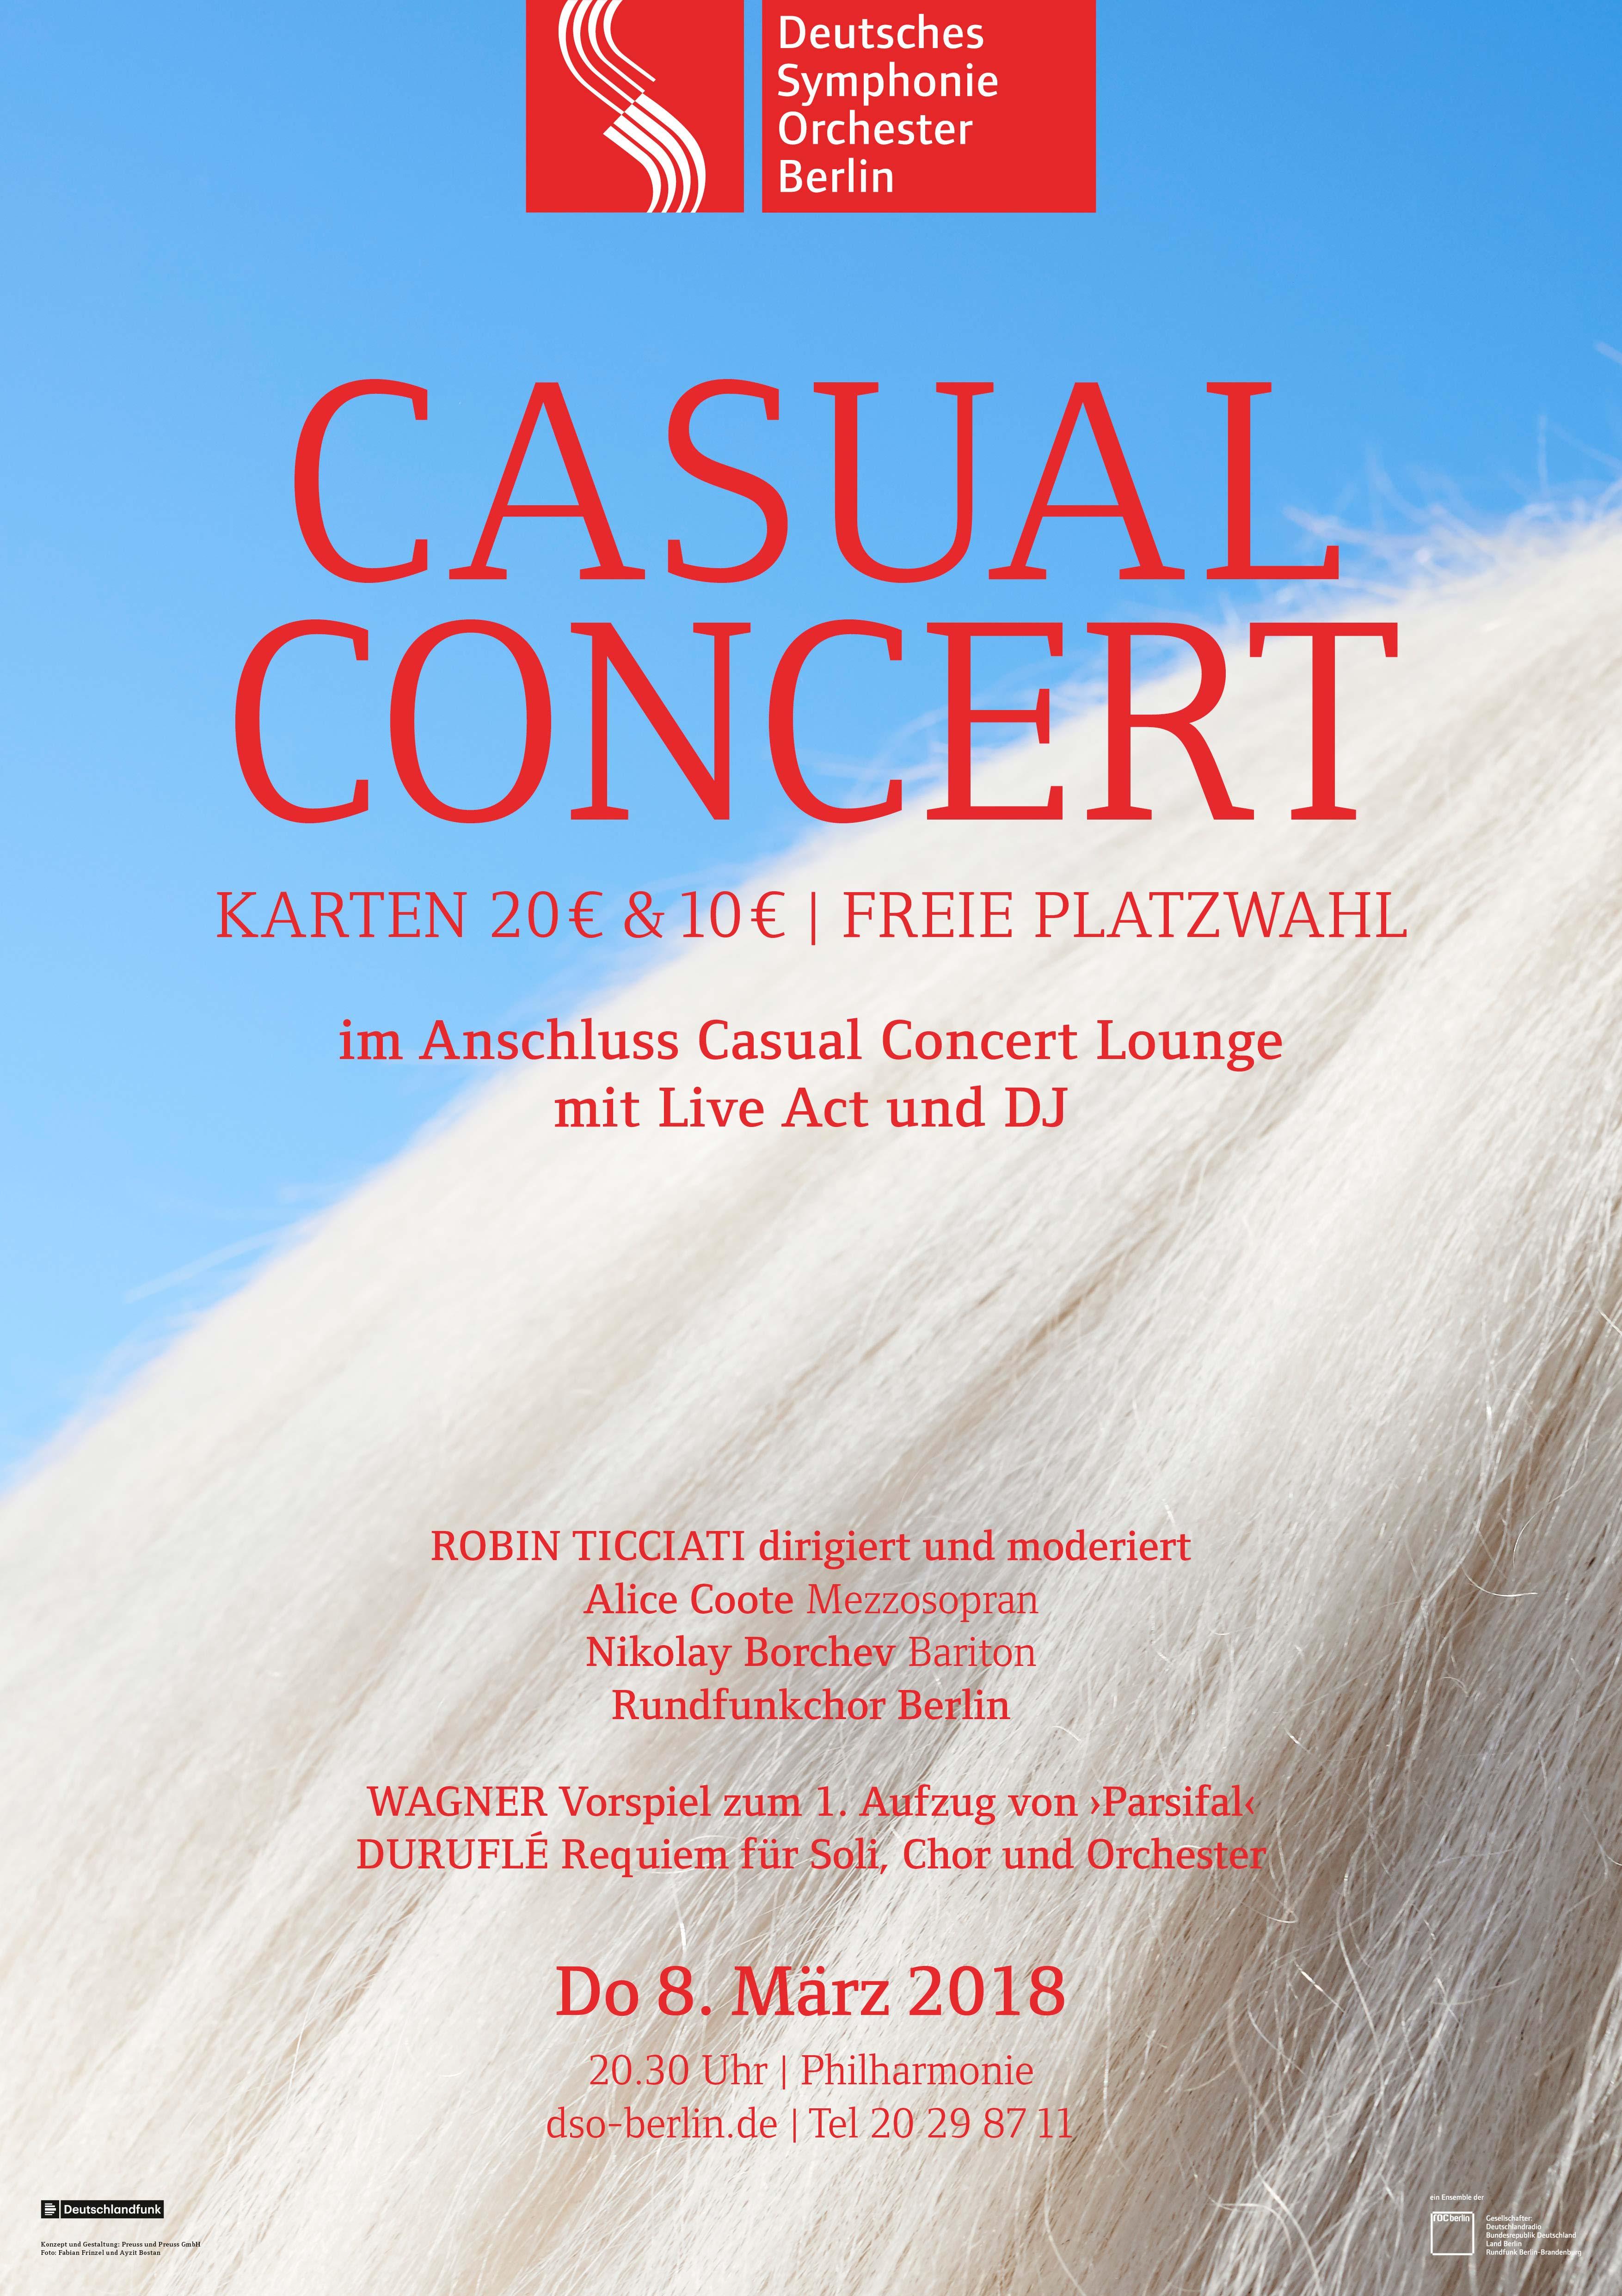 Plakat Casual Concert